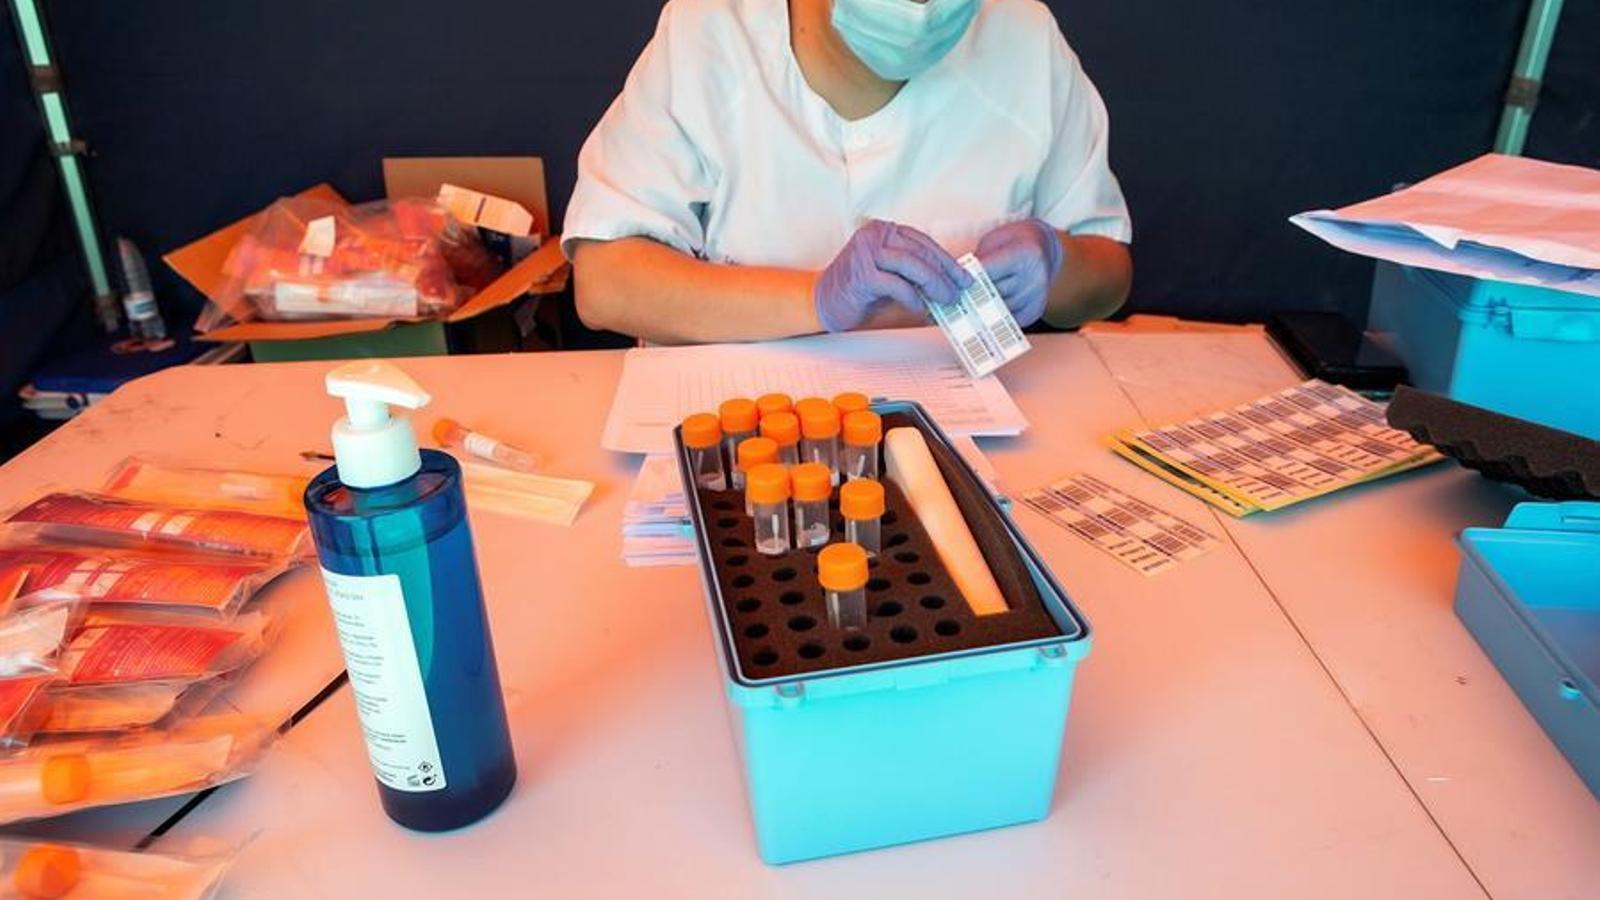 Rússia registra la primera vacuna contra el covid-19